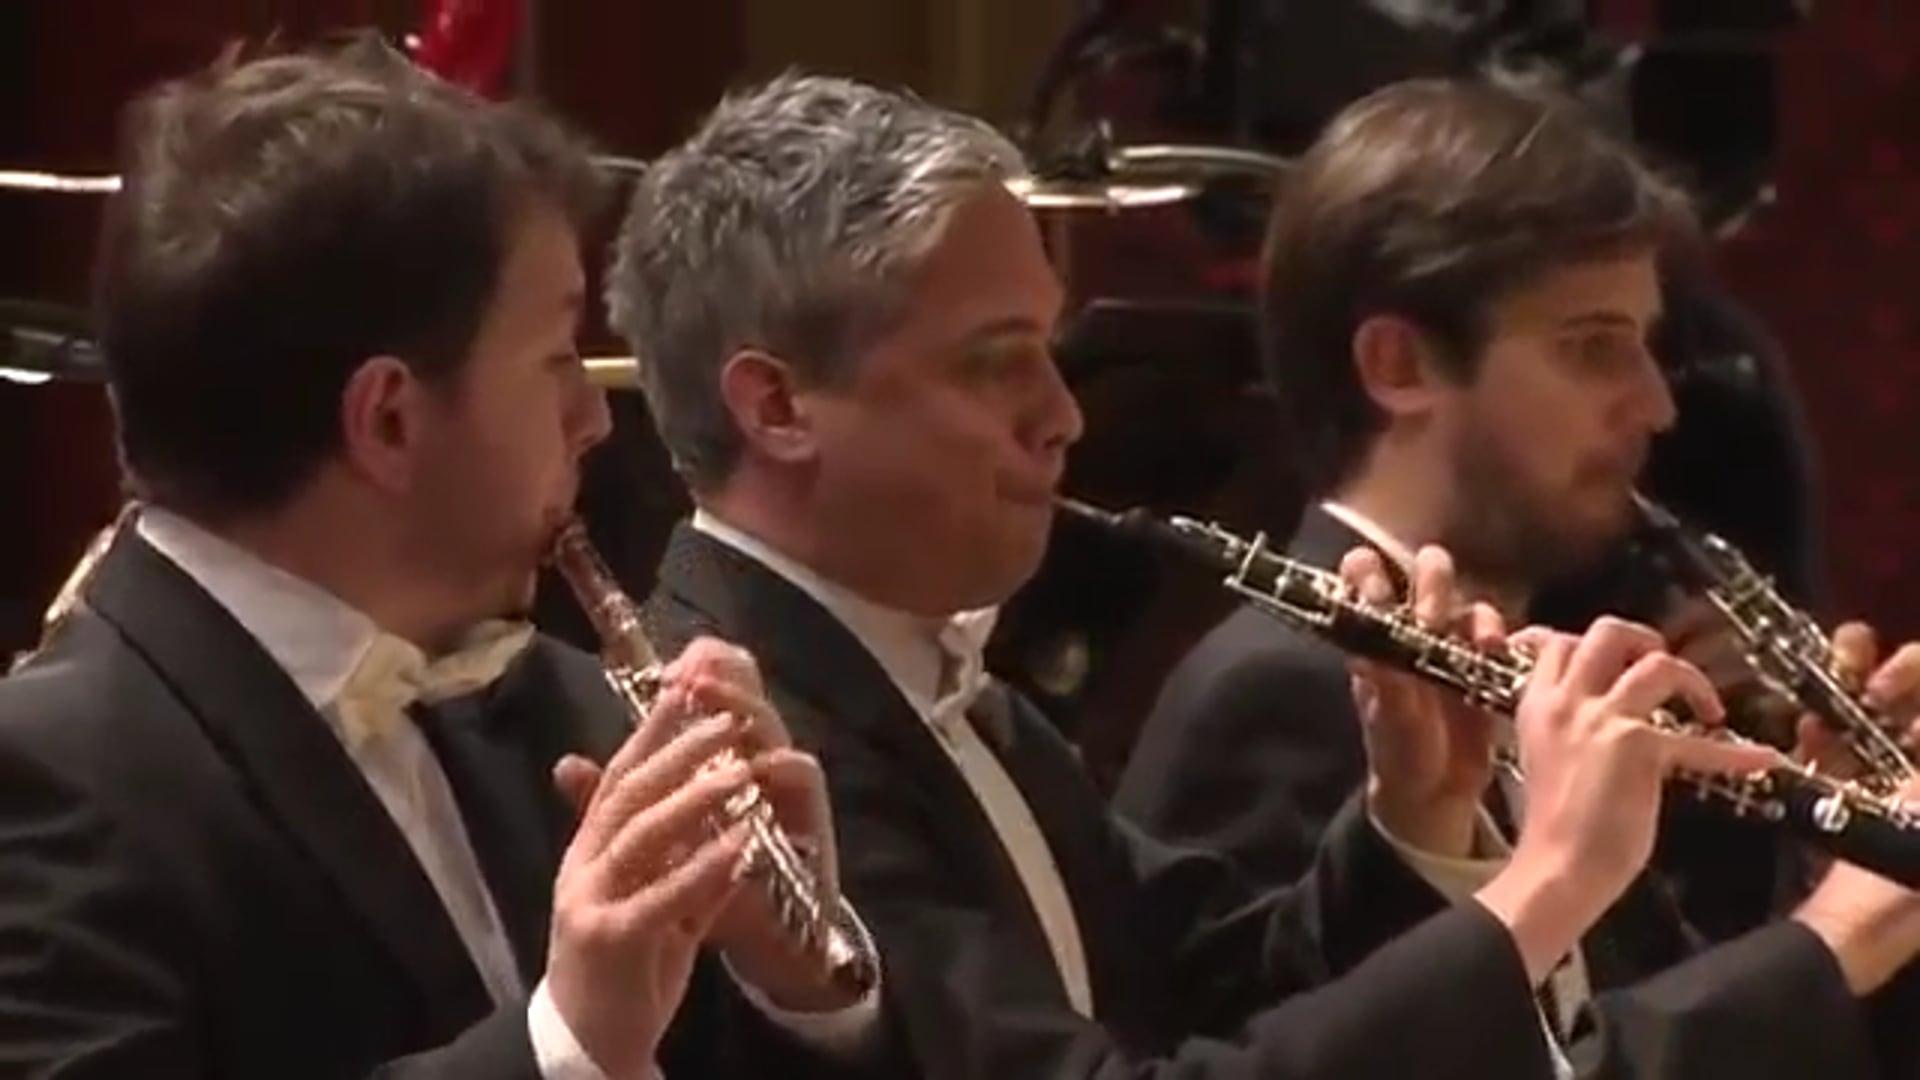 Concours de Genève Ji Yeong Mun, 1st Prize piano 2014, Alexander Shelley conductor - © Genève